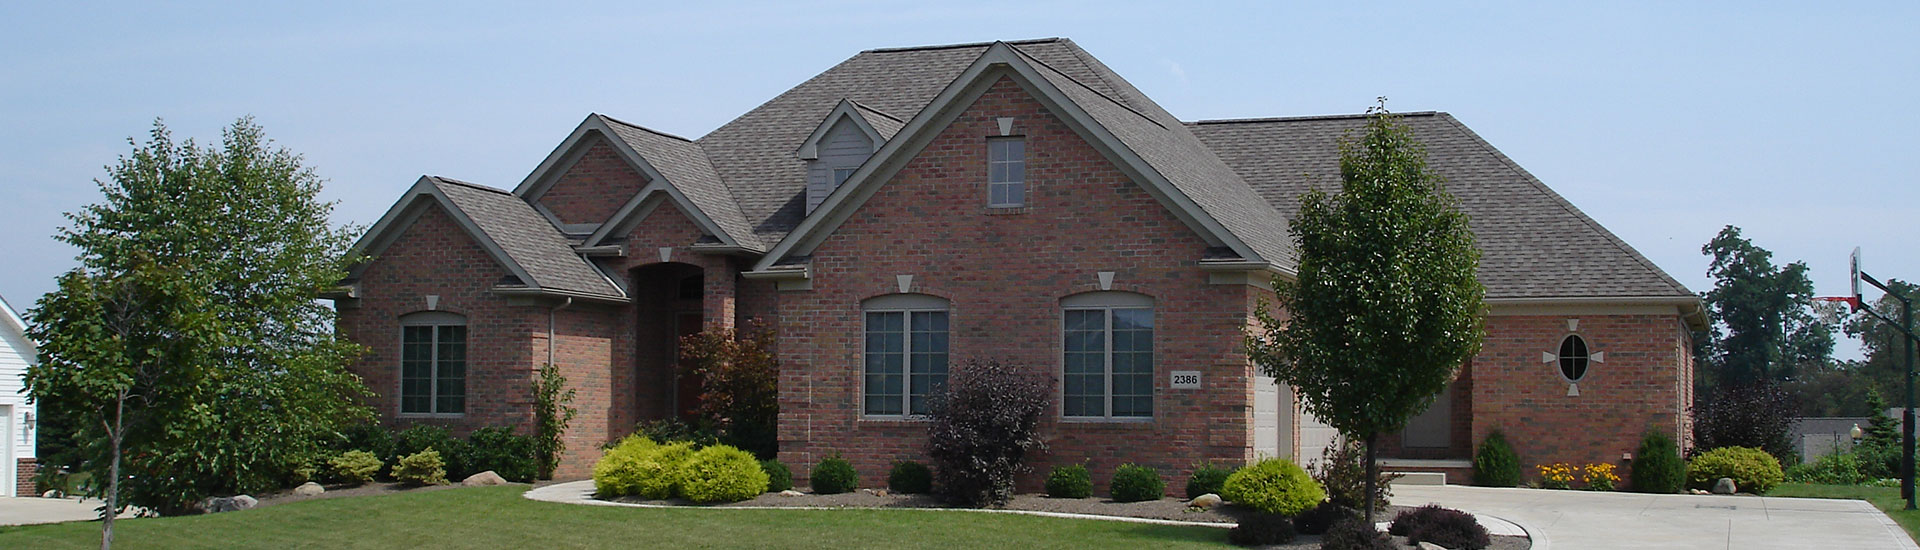 Home Loans Birmingham Al